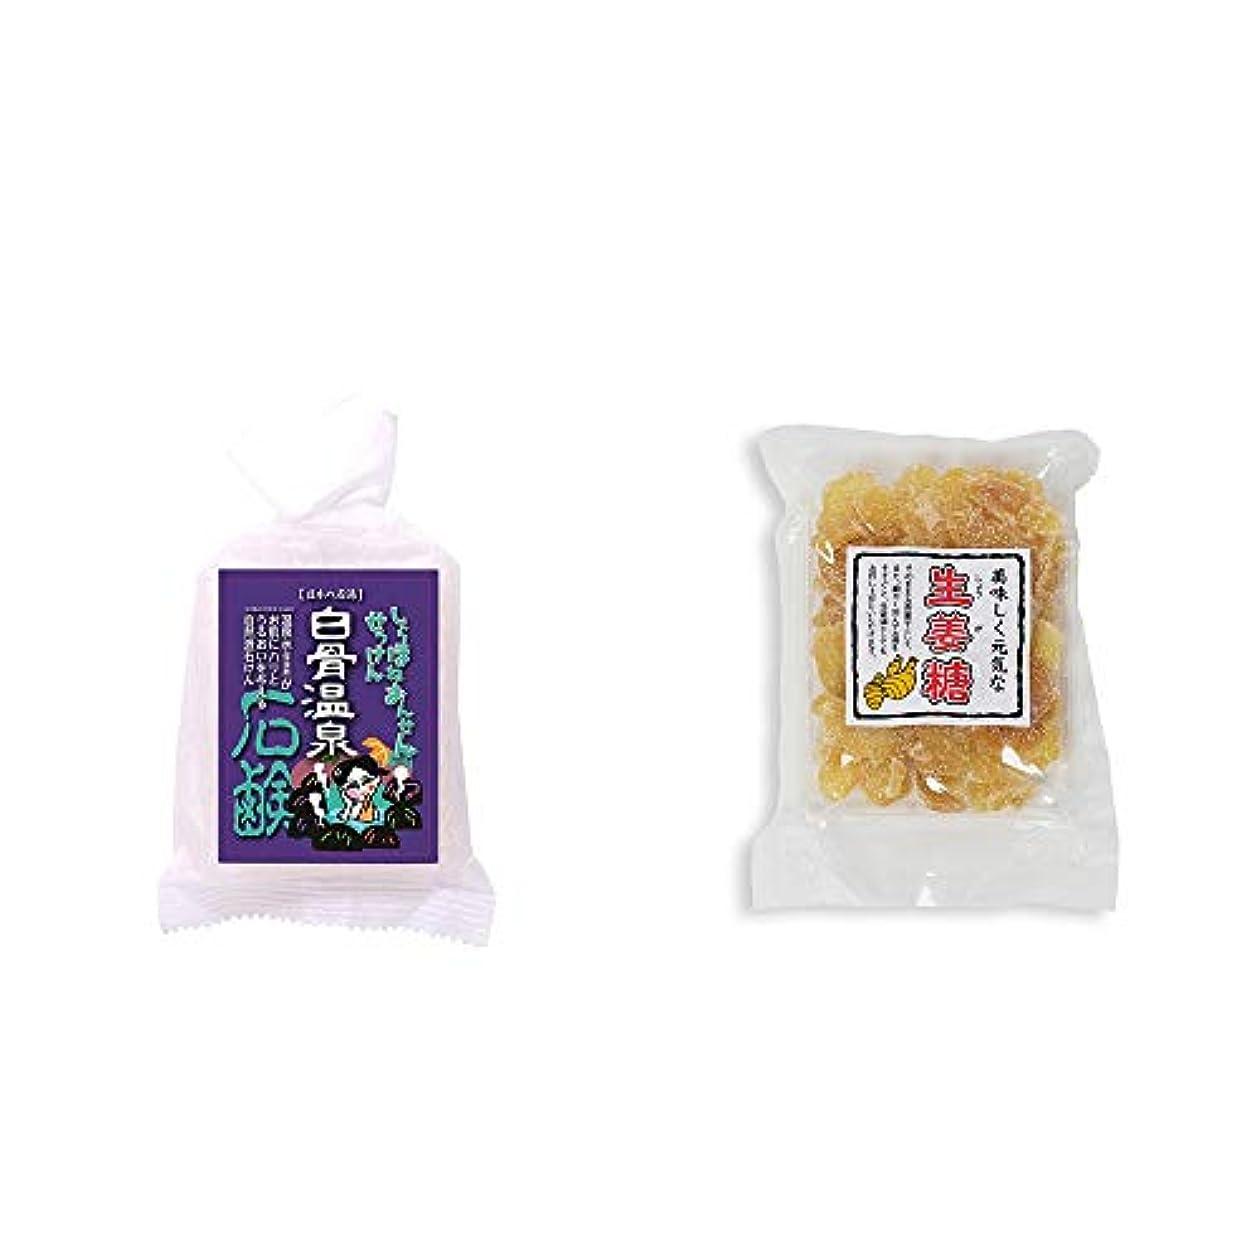 母音性能配送[2点セット] 信州 白骨温泉石鹸(80g)?生姜糖(230g)